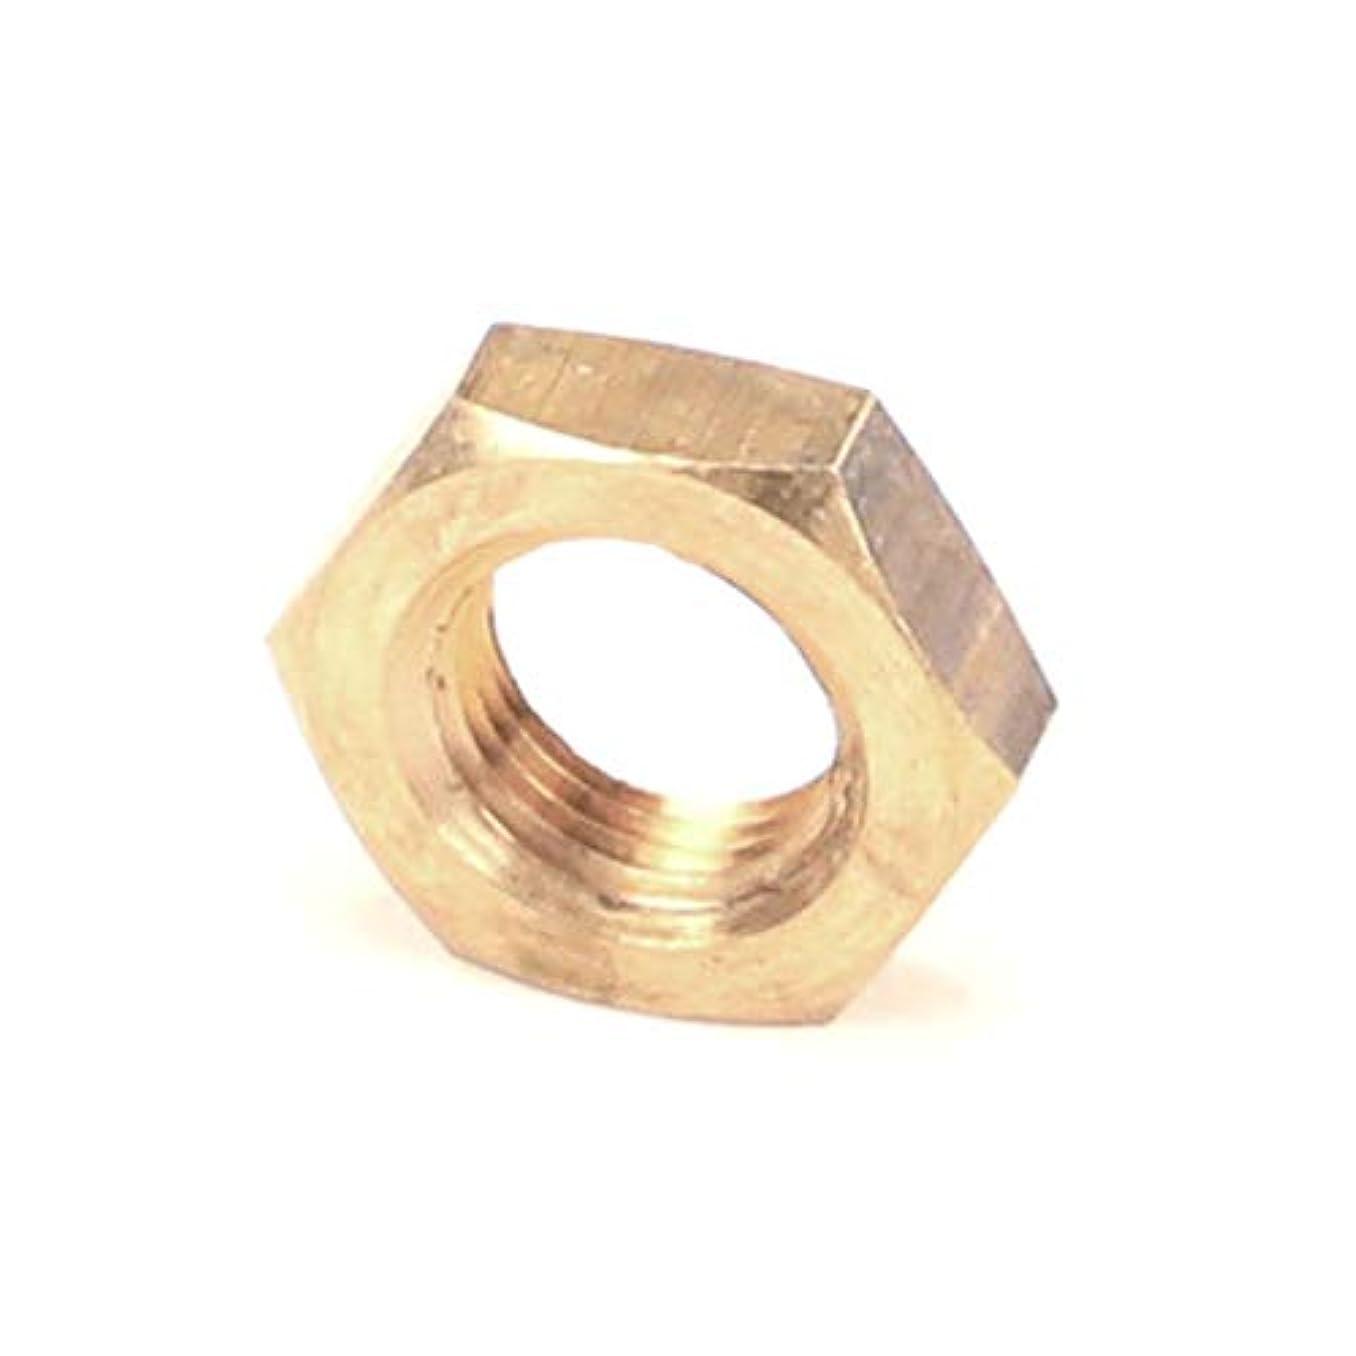 Fetco 1031.00020.00 Locknut, 1/8 Straight Pipe Thread